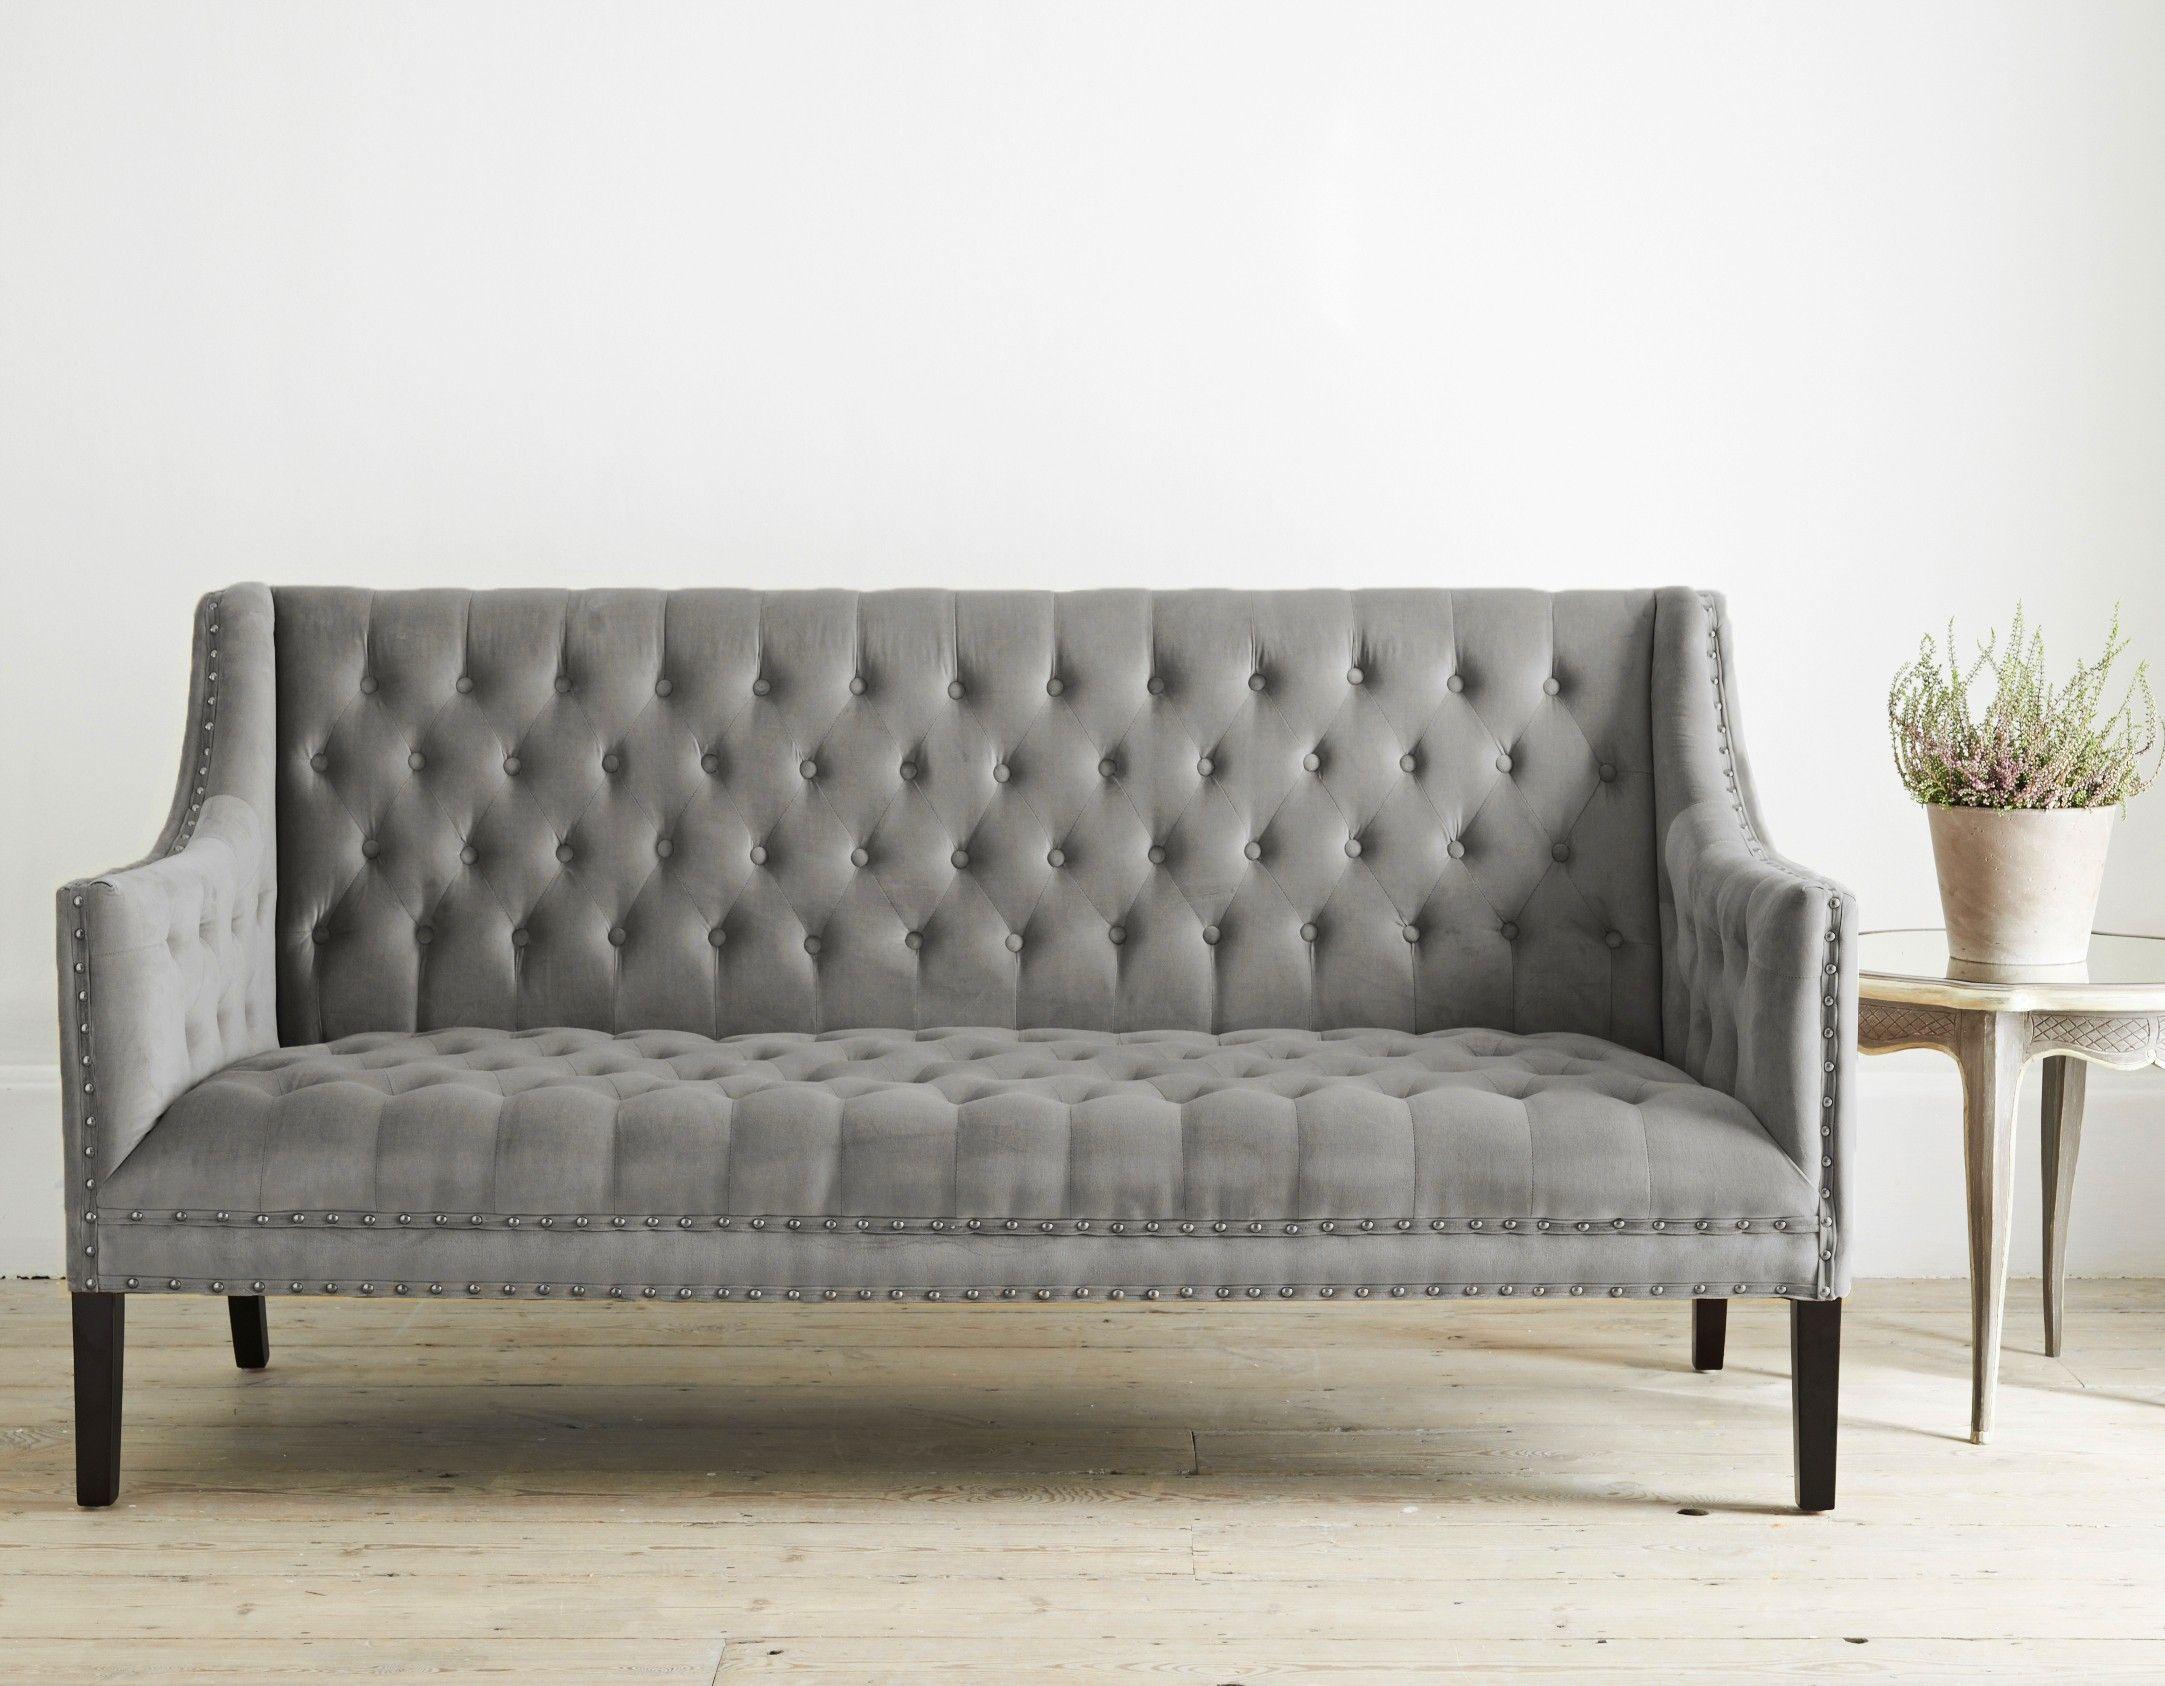 Sophisticated 3 seater sofa in an grey velvet upholstery for Studded sofa sets